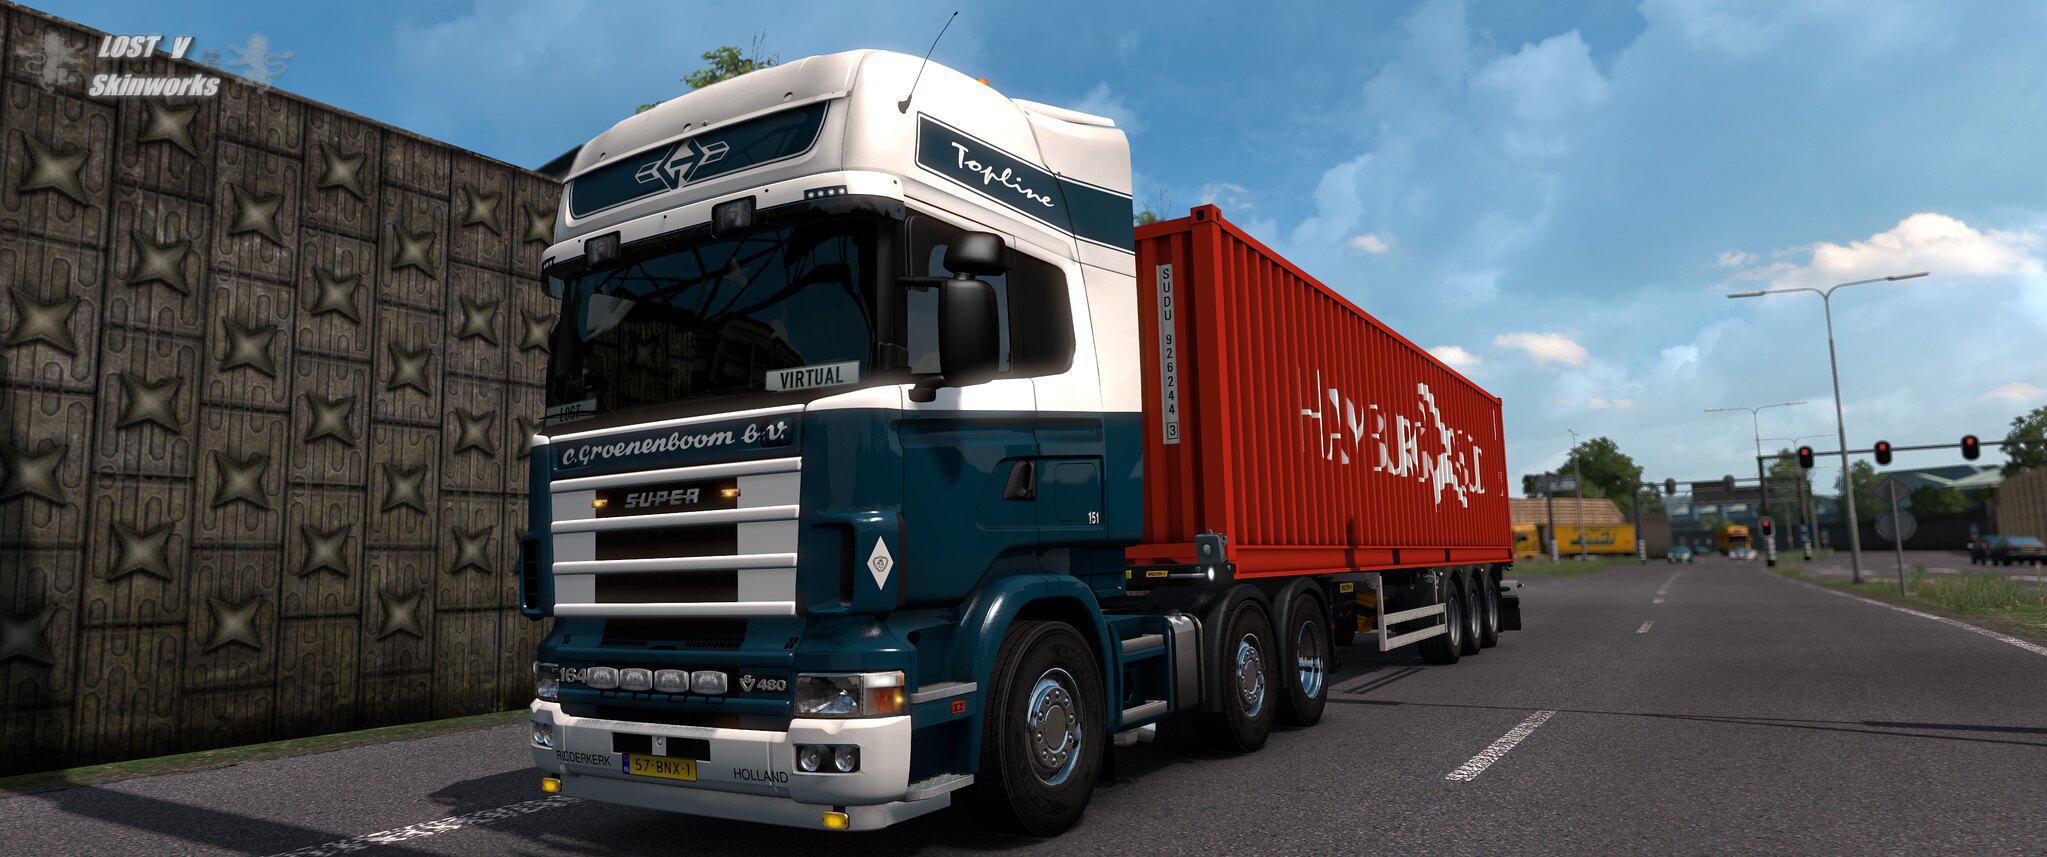 ETS2 - Scania RJL Groenenboom Transporten Skin V1 (1.37.x)